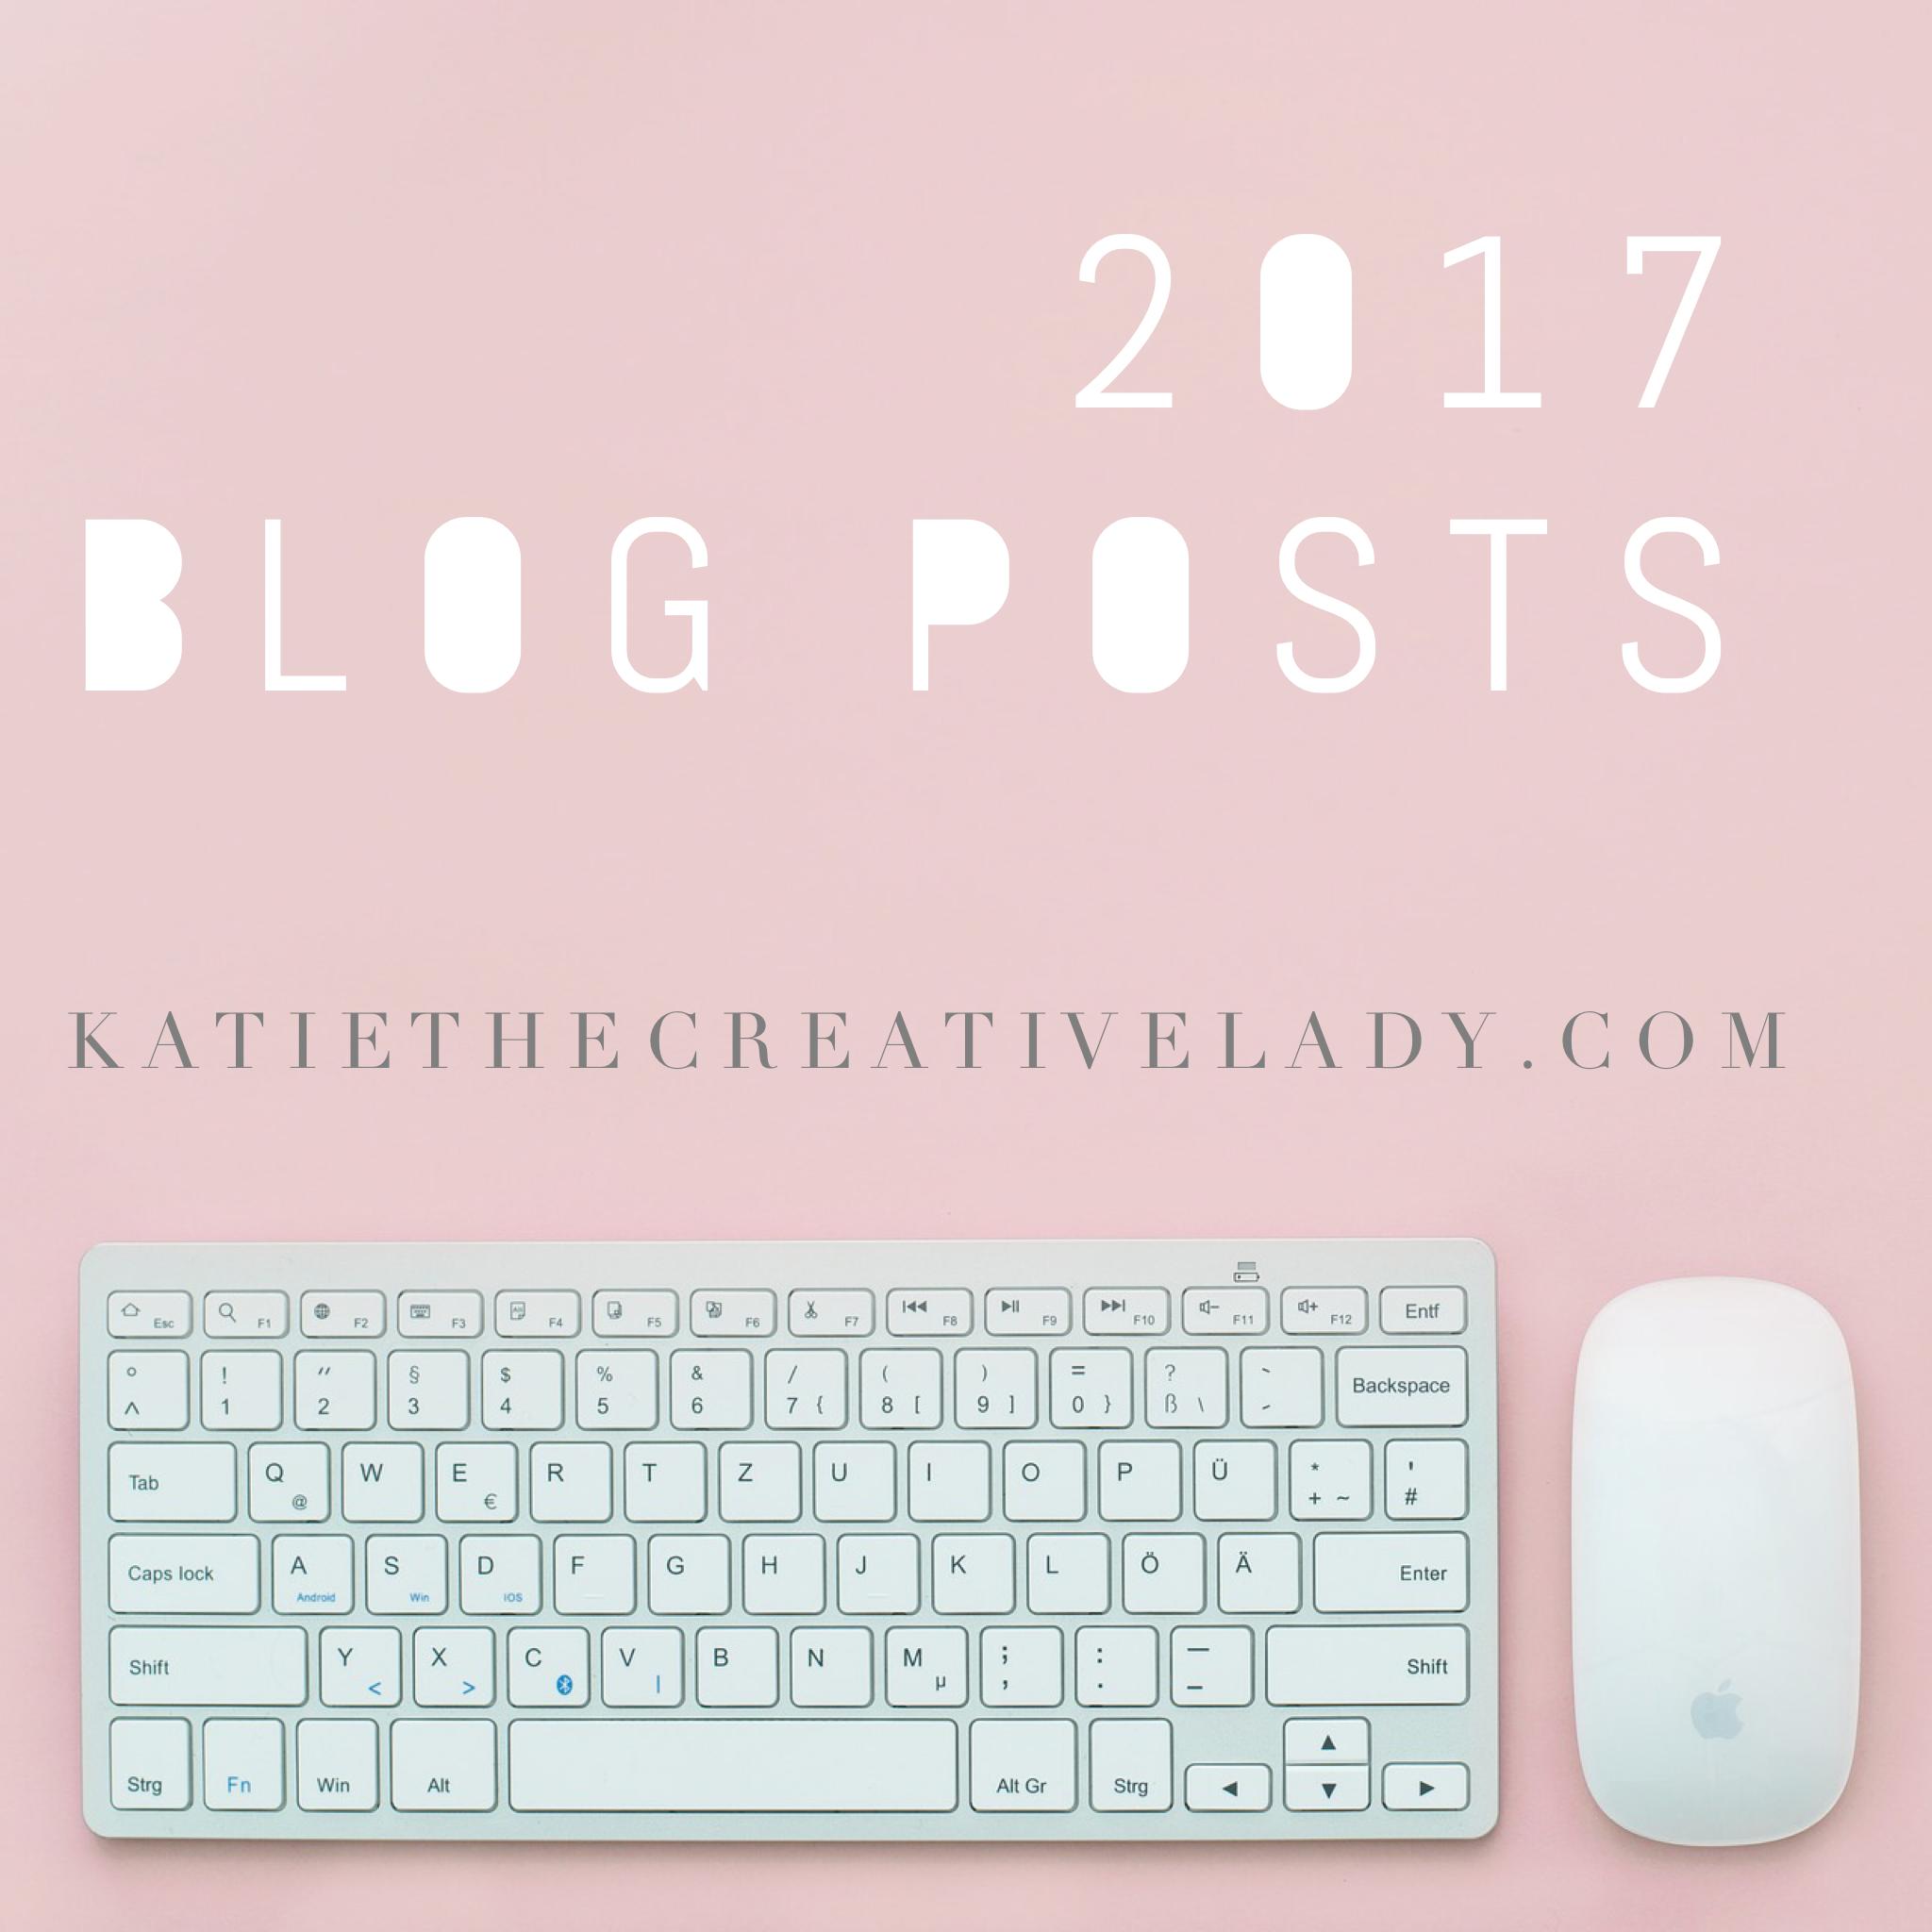 2017 blog posts.PNG